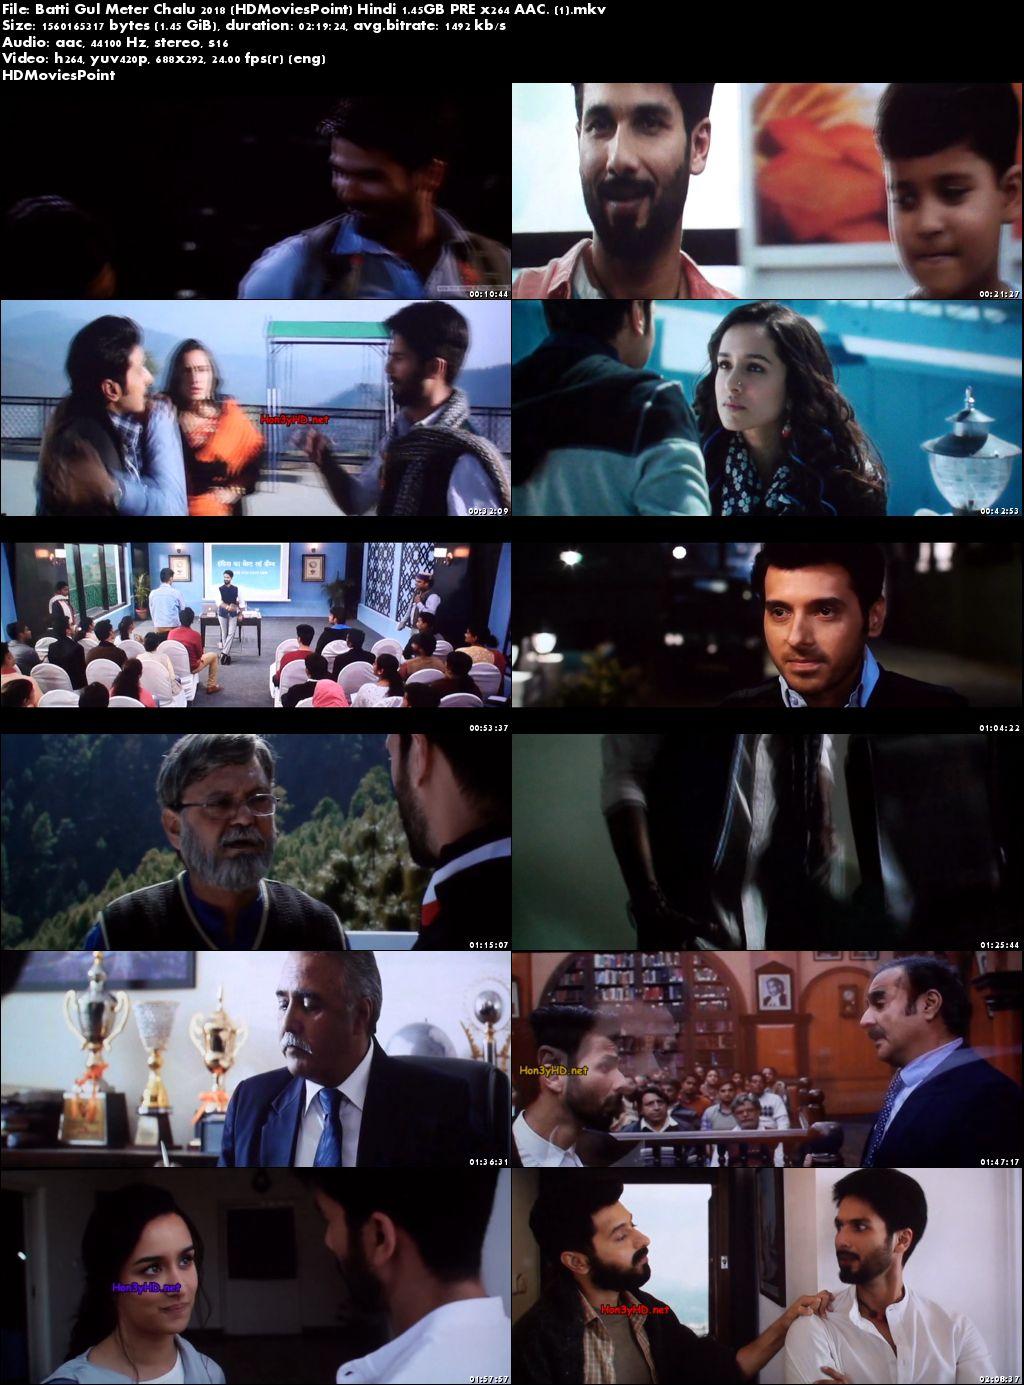 Screen Shots Batti Gul Meter Chalu 2018 Full Movie Download Hindi 720p